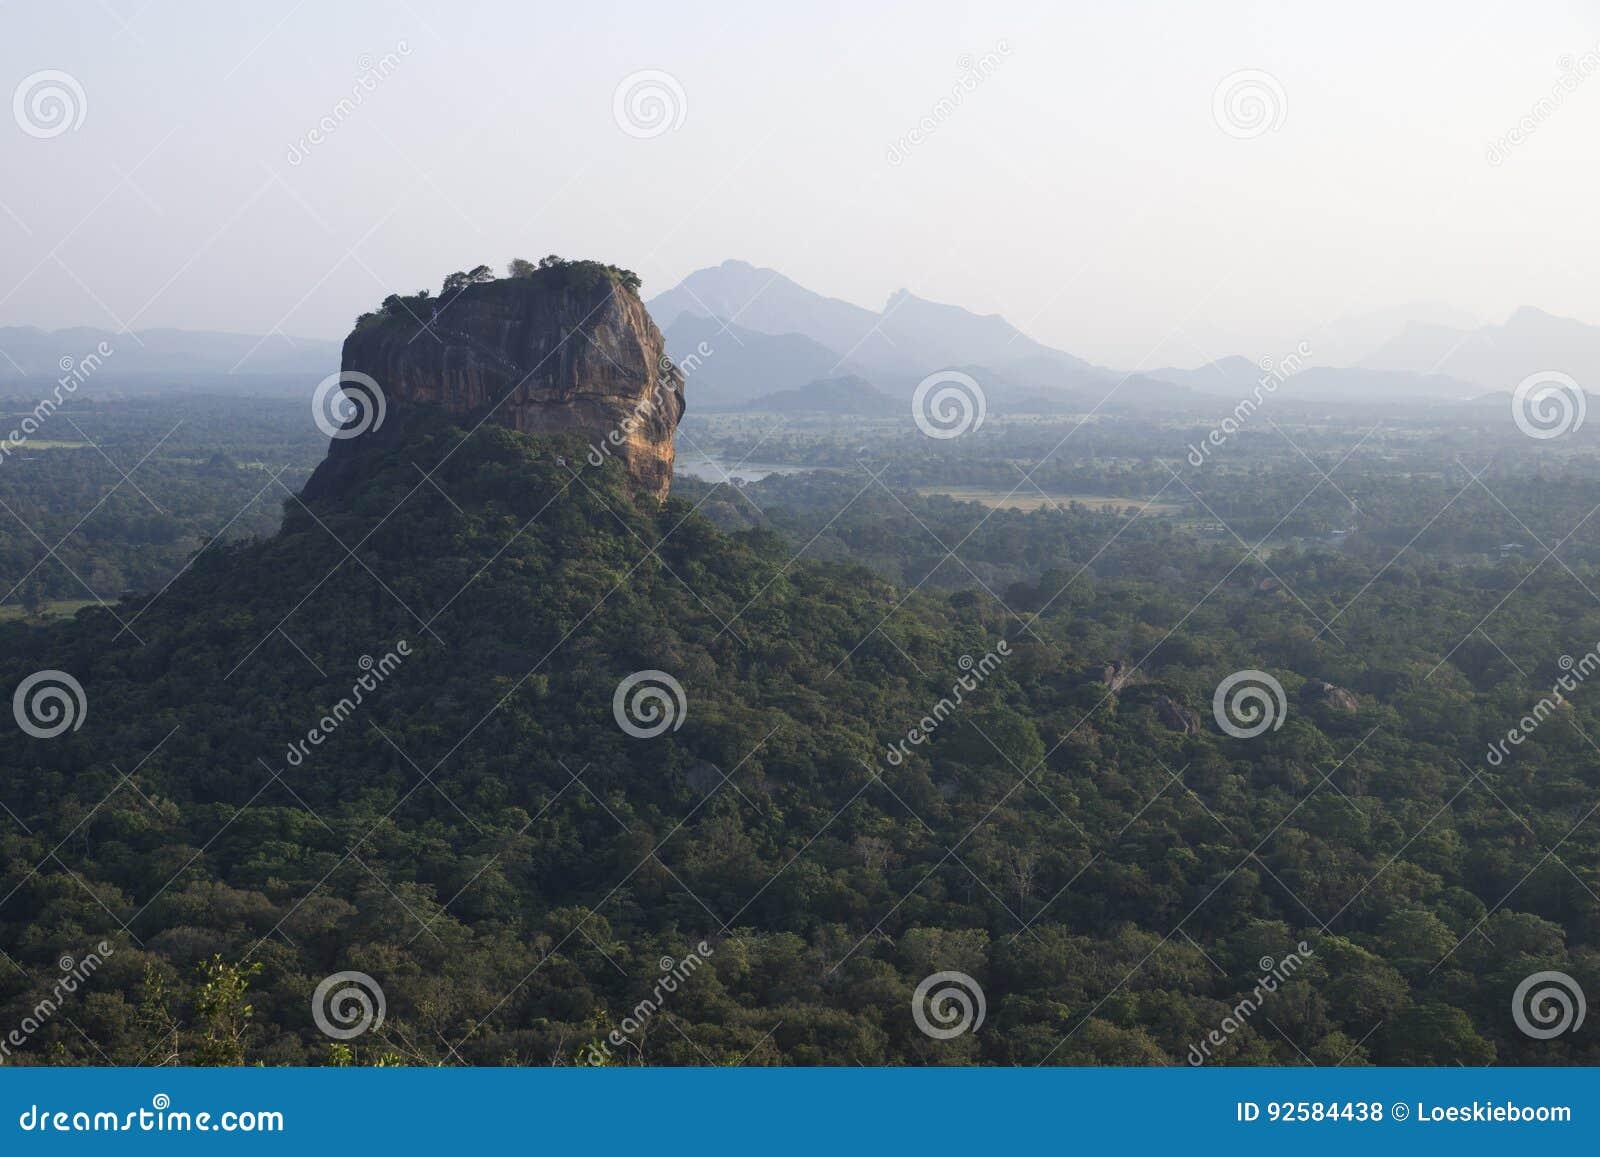 Lions Rock Sigiriya, Sri Lanka